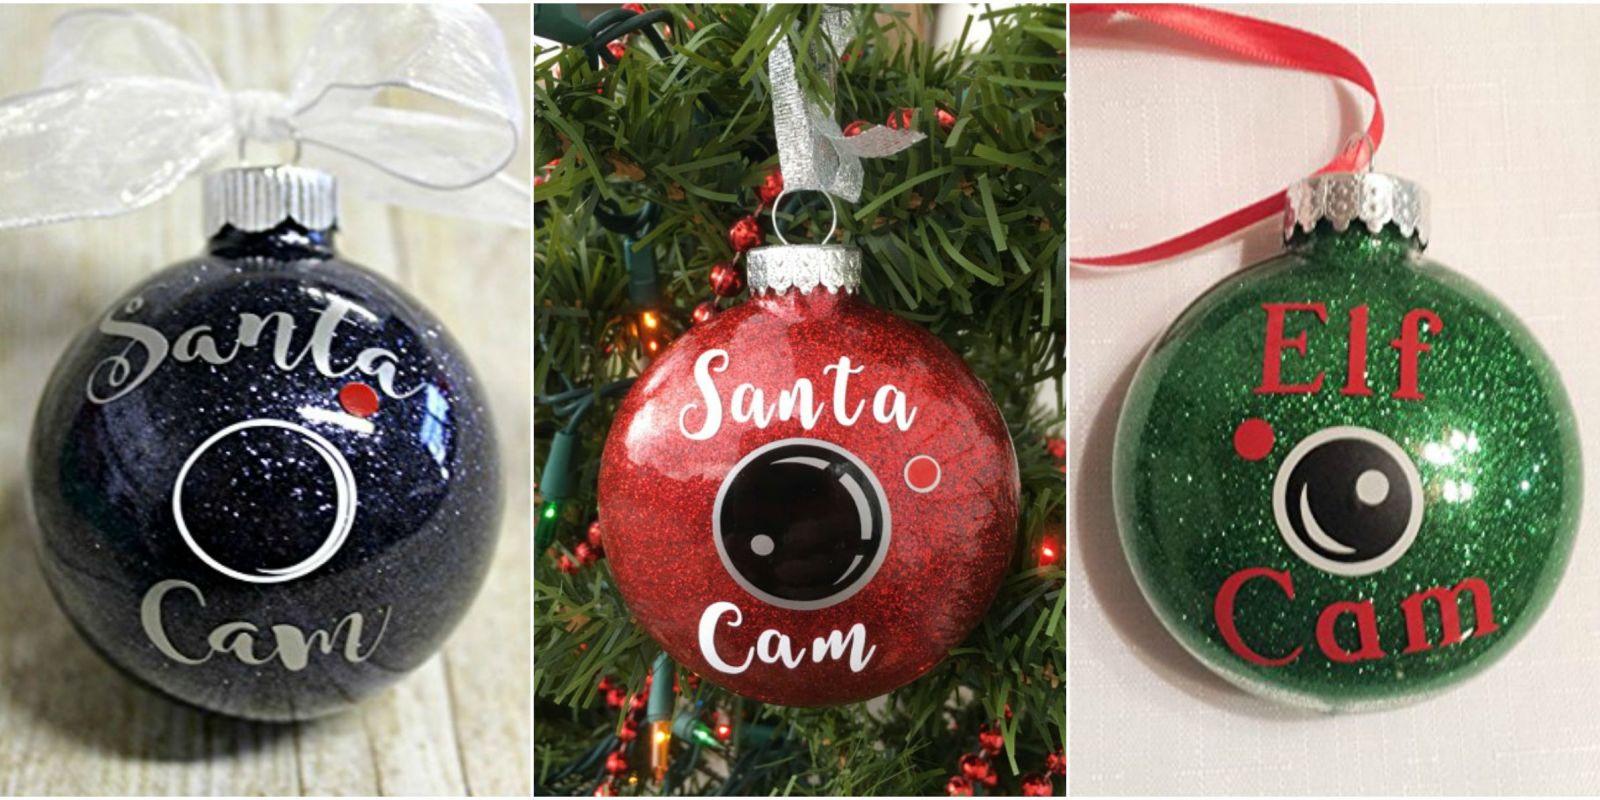 Camera christmas ornaments - Camera Christmas Ornaments 12